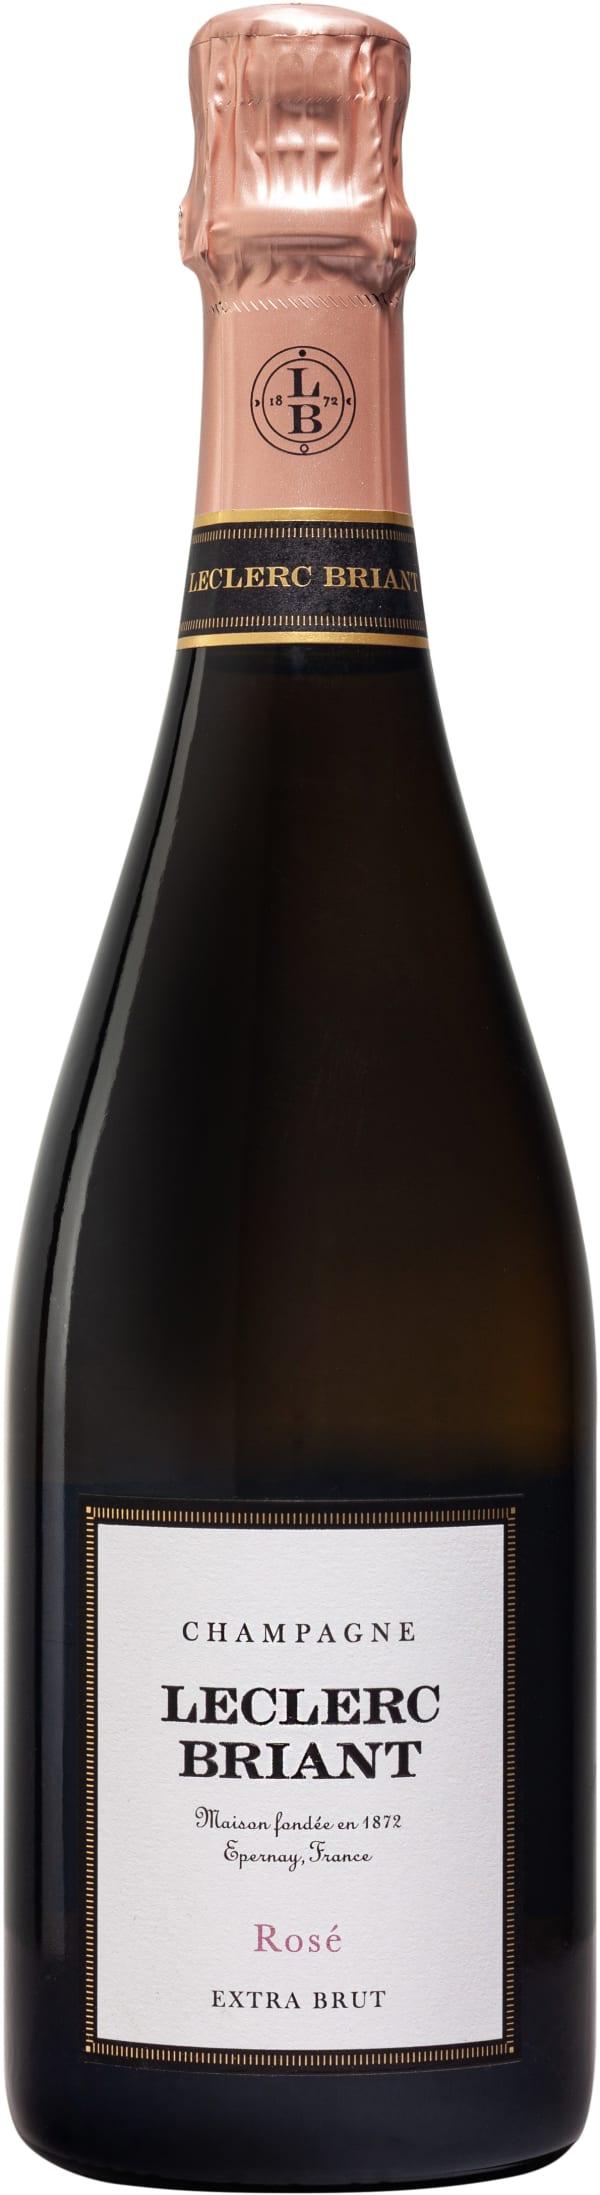 Leclerc Briant Rosé Champagne Brut